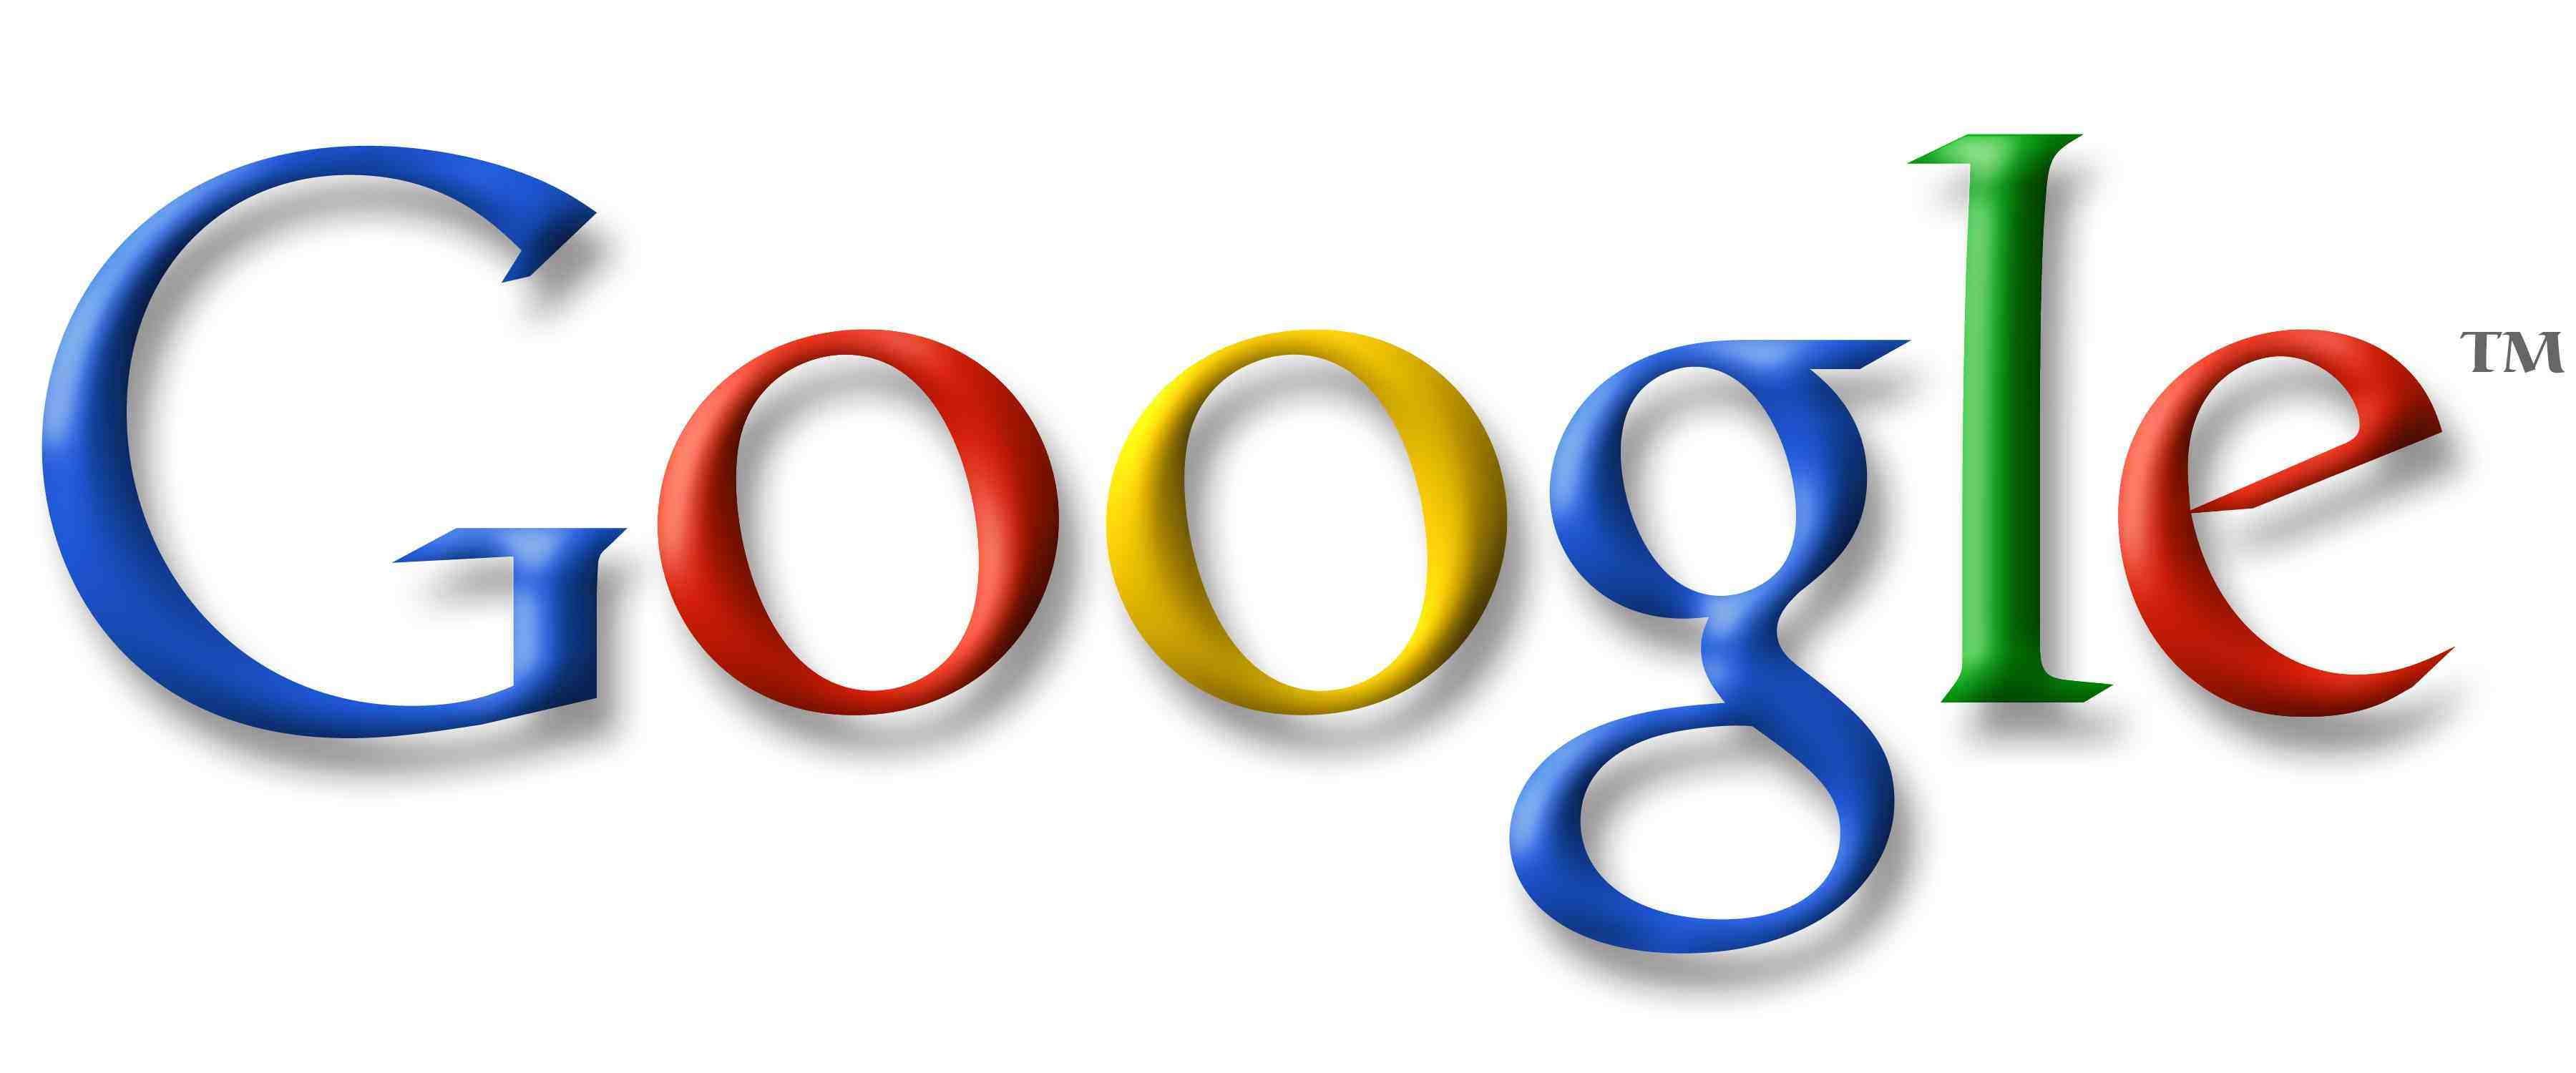 google logo free images at clker com vector clip art online rh clker com google clip art images free google clip art images free